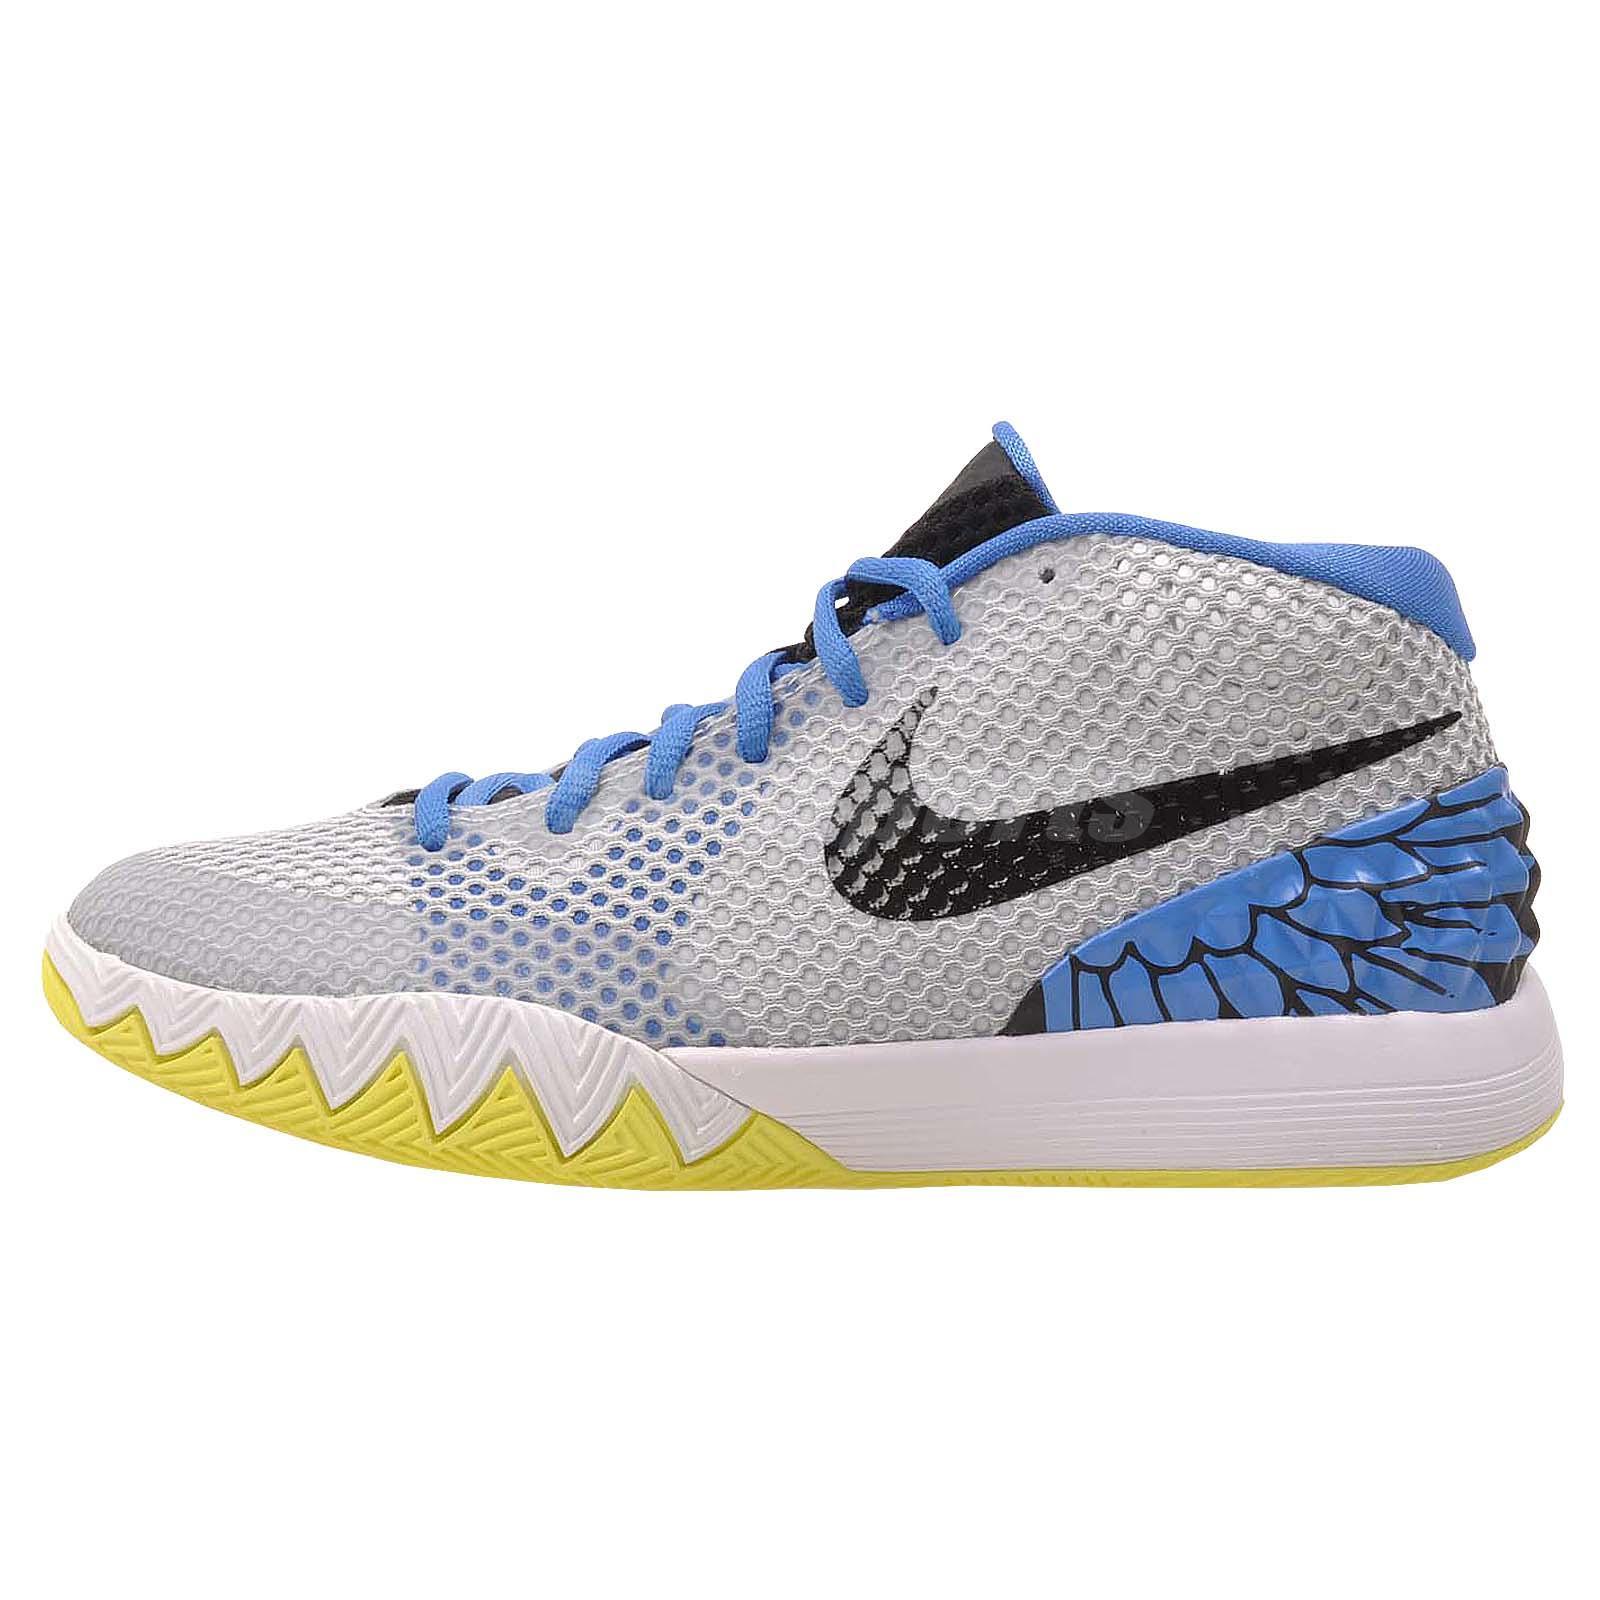 nike kyrie 1 gs kids youth boys girls basketball shoes